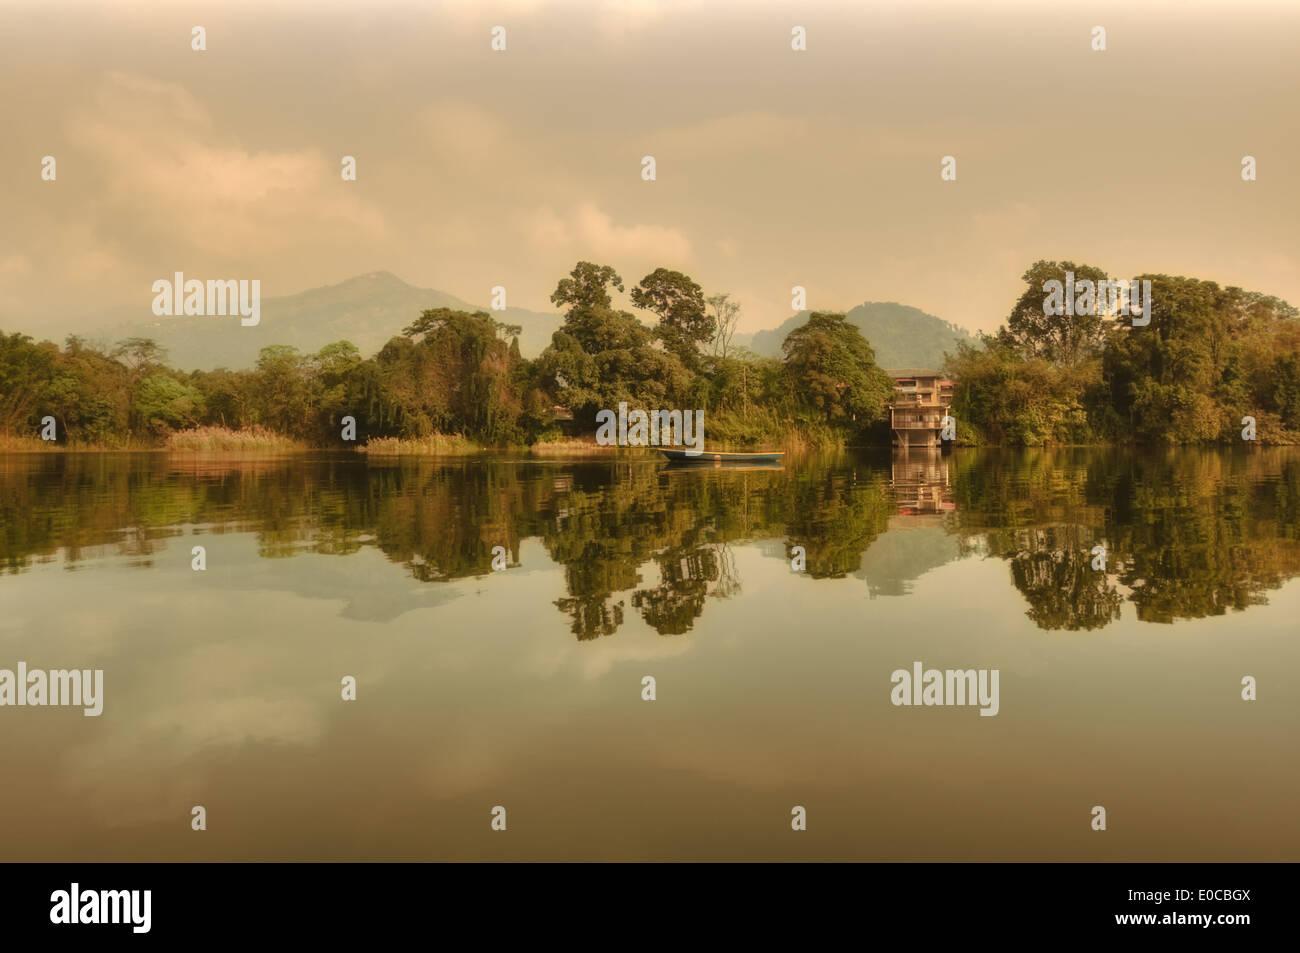 Pokhara lake sun rising reflection in rainy day in Nepal - Stock Image